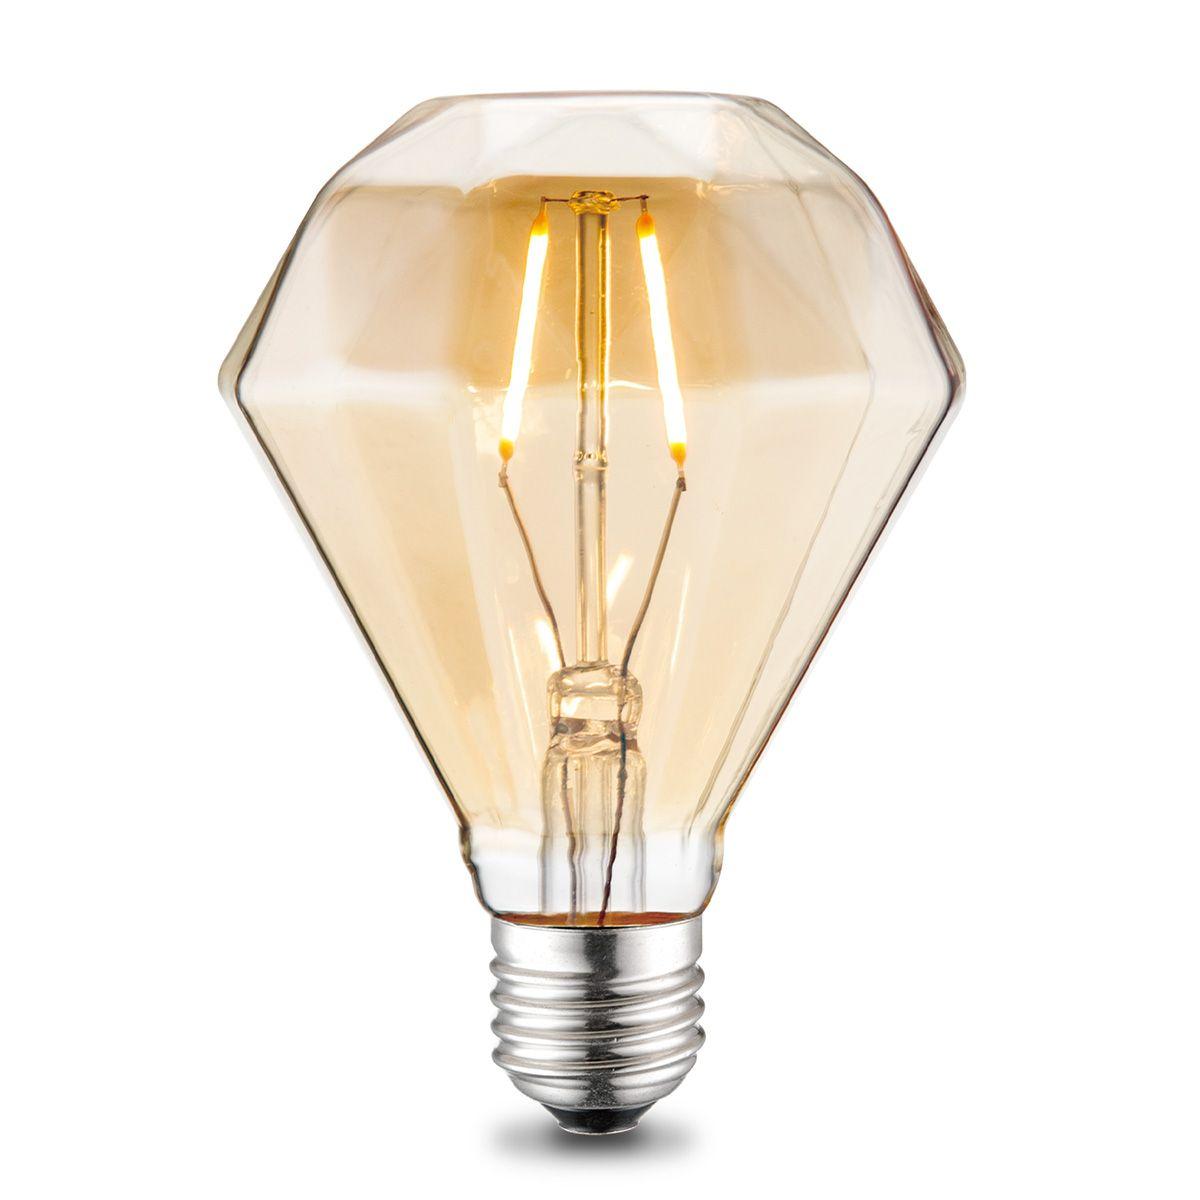 Light depot LED lamp Diamond E27 2W amber Outlet